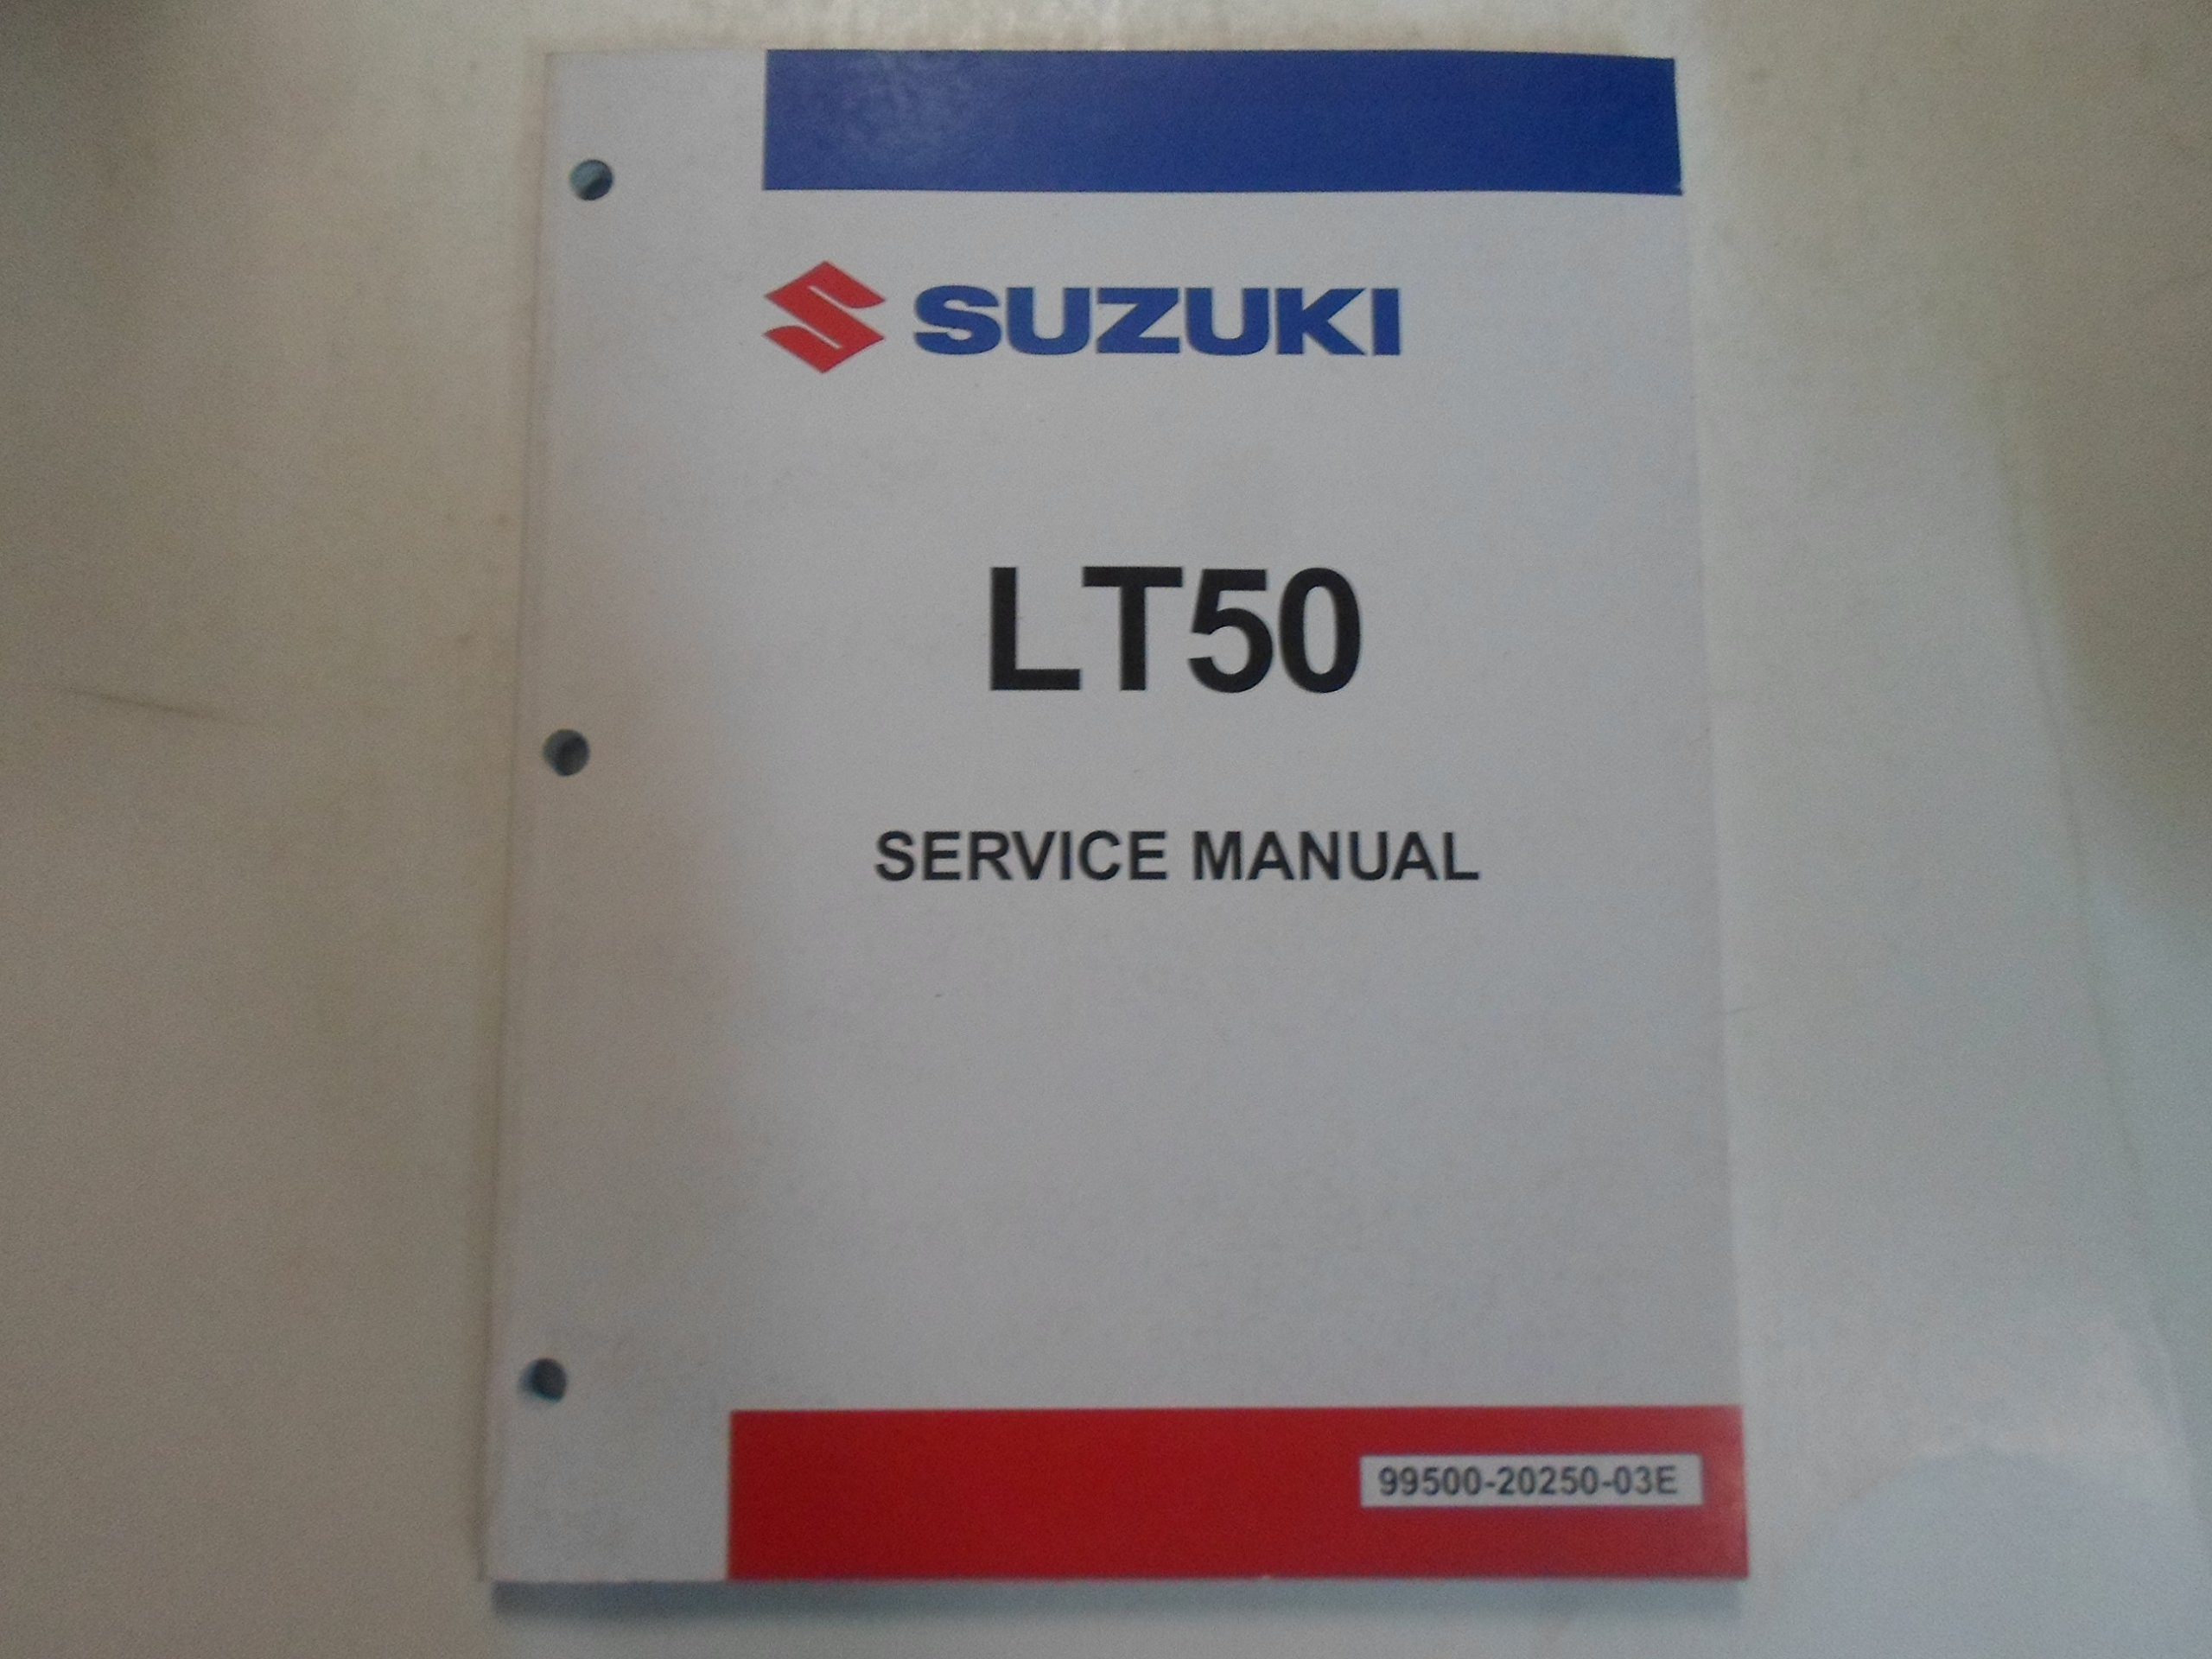 1985 Suzuki LT50 Service Repair Shop Manual STAINED FACTORY OEM BOOK 85  DEAL: SUZUKI: Amazon.com: Books